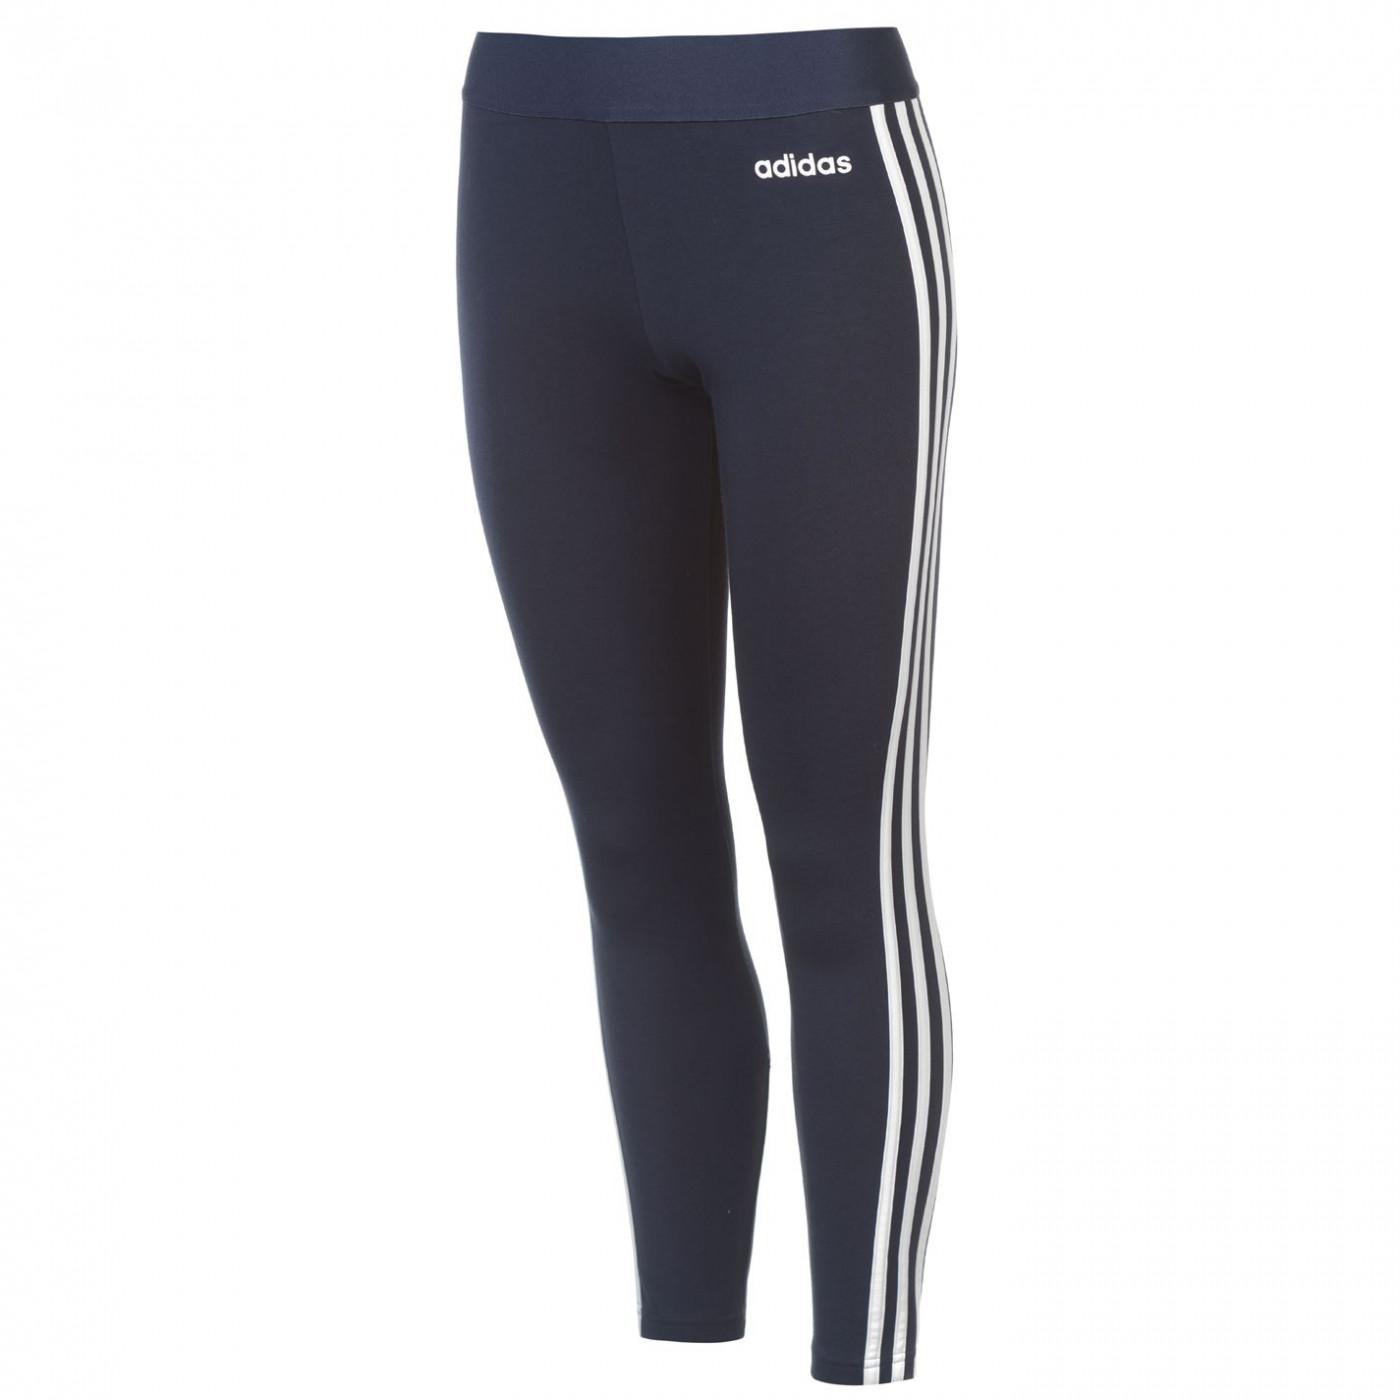 Women's leggins Adidas  Essential 3 Stripe